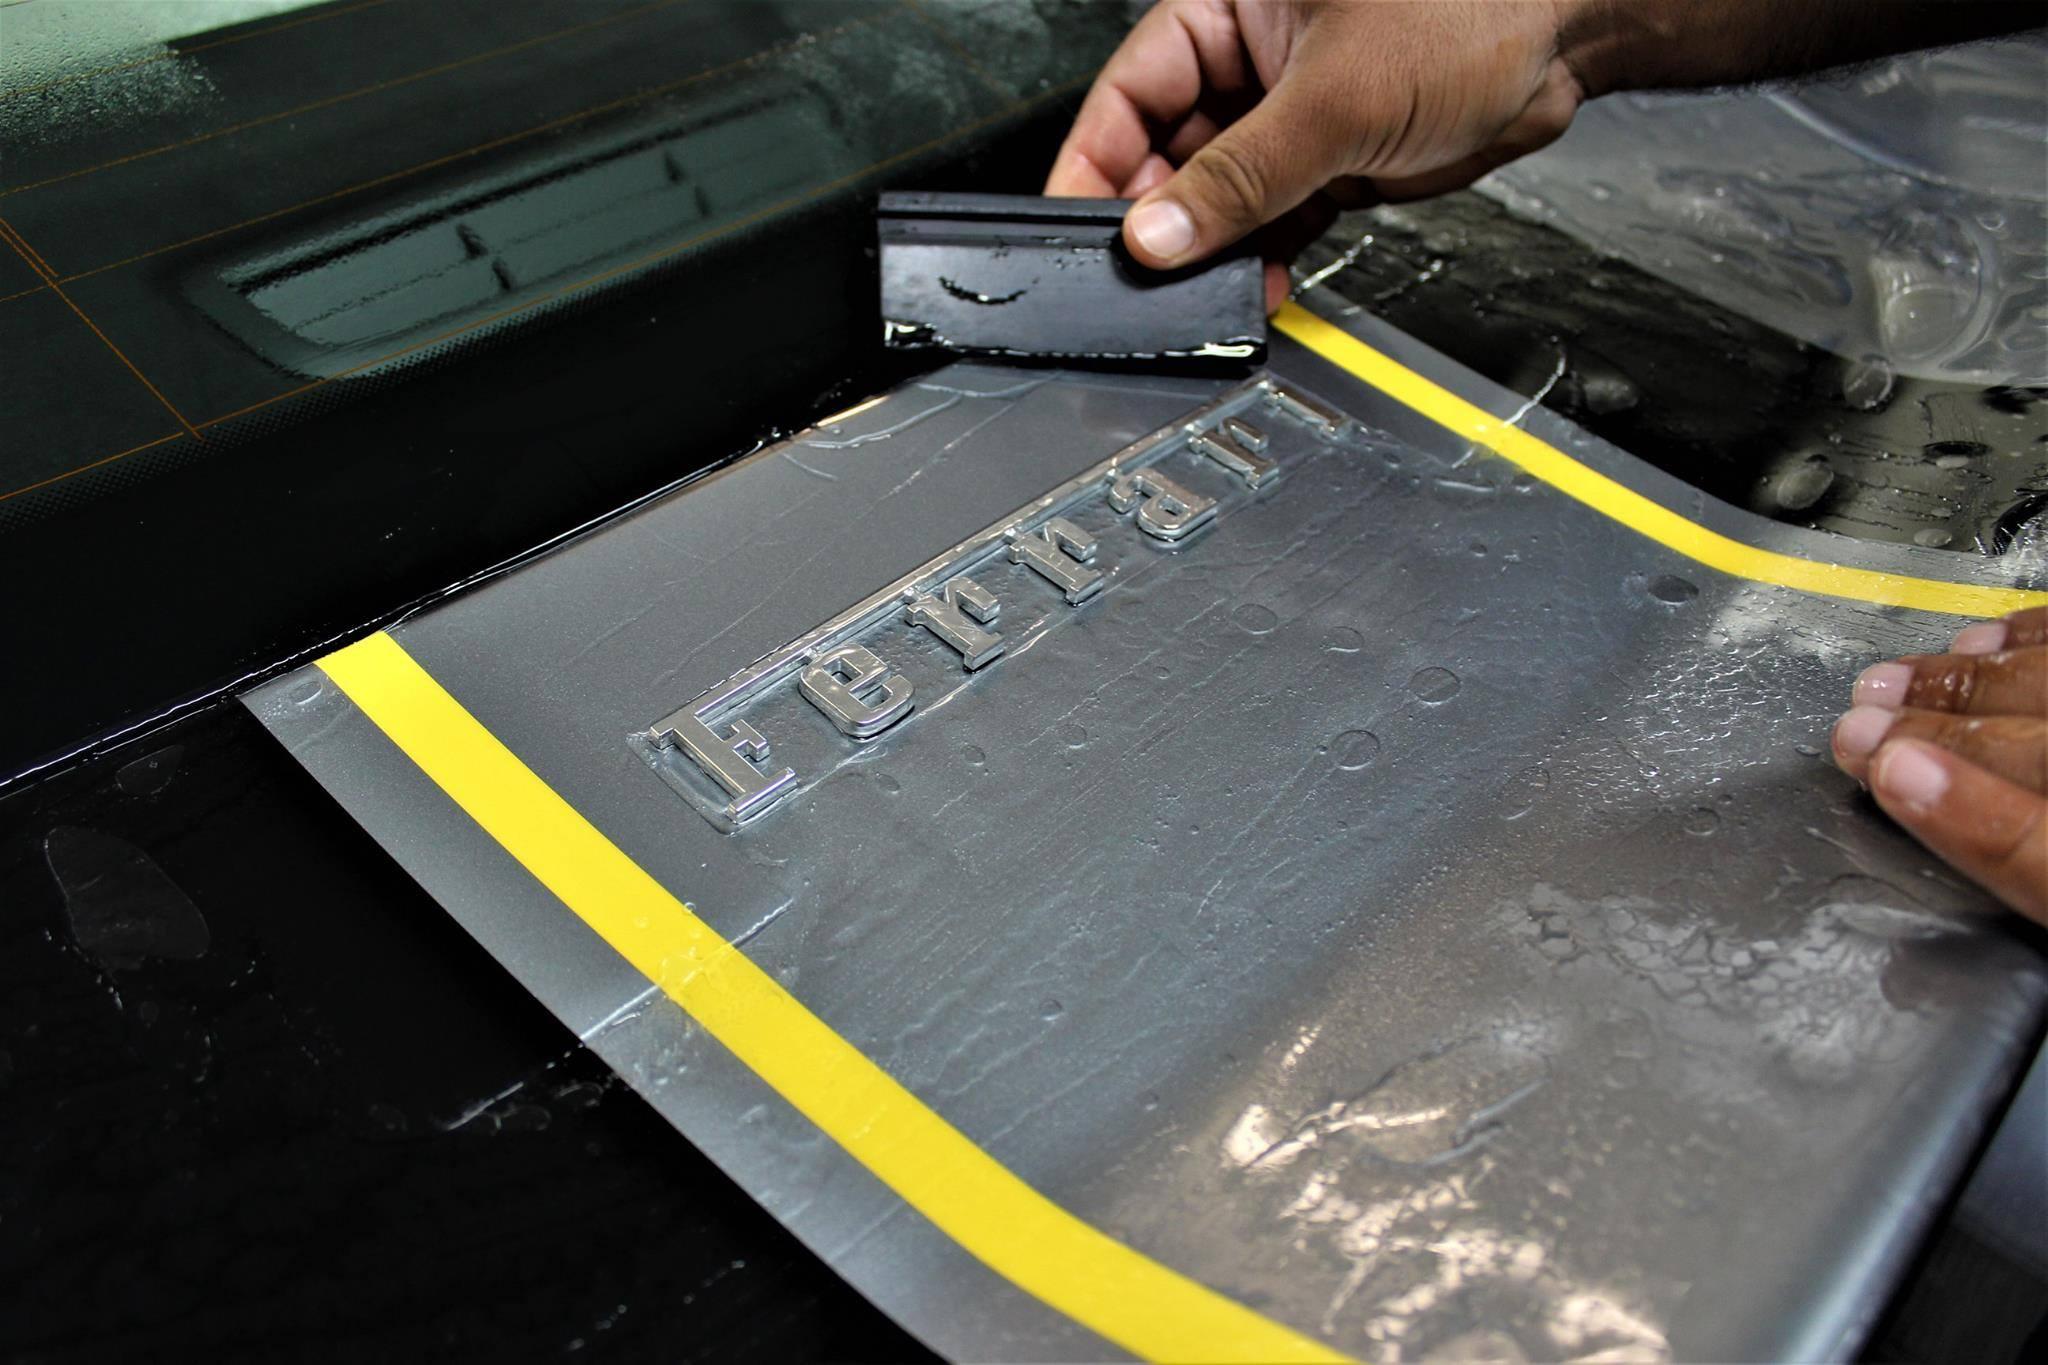 paint protection adelaide, GTR, GTC. 2016, 2017, 2018, mercedes, gtr, AMG, biturbo, #beastofthegreenhell, AMG Green Hell Magno, c63, c63s, customised, car bra, stone chip film, paint protection film, winguard, adelaide, matte paint, adelaide, matt paint, decal, tint, XPEL, Ultimate, Stealth, best paint protection adelaide, adelaide paint protection, adelaide. paint. protection, adelaide car bra, lamborghini, Murcielago, LP670, LP650, LP640, SV, customised, car bra, stone chip film, paint protection film, winguard, adelaide, matte paint, adelaide, matt paint, decal, tint, XPEL, Ultimate, Stealth, SUNTEK film, winguard australia, paint protection adelaide, GTR, GTC. 2016, 2017, 2018, mercedes, gtr, AMG, biturbo, #beastofthegreenhell, AMG Green Hell Magno, c63, c63s, customised, car bra, stone chip film, paint protection film, winguard, adelaide, matte paint, adelaide, matt paint, decal, tint, XPEL, Ultimate, Stealth, best paint protection adelaide, adelaide paint protection, adelaide. paint. protection, adelaide car bra, lamborghini, Murcielago, LP670, LP650, LP640, SV, customised, car bra, stone chip film, paint protection film, winguard, adelaide, matte paint, adelaide, matt paint, decal, tint, XPEL, Ultimate, Stealth, SUNTEK film, winguard australia, paint protection adelaide. car bra adelaide, xpel, suntek, plastic film protection for cars, paint protection wrap, car film paint protection, gtechniq adelaide, xpel adelaide, xpel fusion adelaide, xpel film adelaide, paint protection adelaide, ceramic paint coating adelaide, 3m protective film for cars adelaide. Paint protection adelaide reviews, paint protection winguard reviews, opticoat protection adelaide, car paint protection, wurtzite p85 paint protection, paint correction adelaide, ceramic paint protection, adelaide automotive detailing and paint protection, new car treatment adelaide, ceramic paint protection adelaide, carbon ceramic protection adelaide, suntek tint adelaide, suntek cxp adelaide, suntek carbo